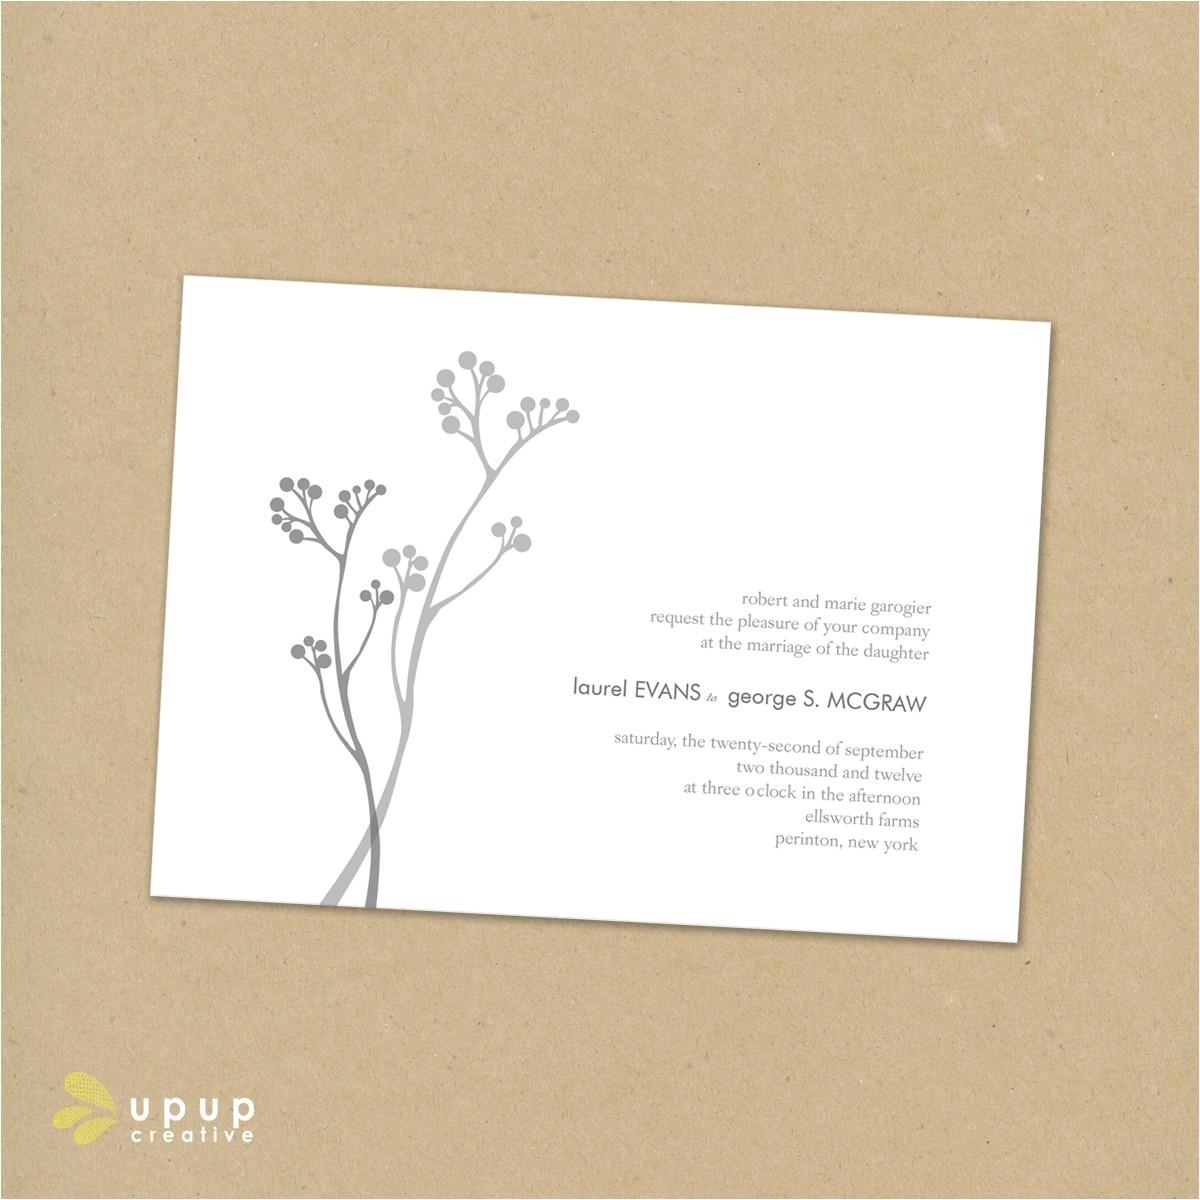 how to wedding invitations costco ideas for silverlininginvitations